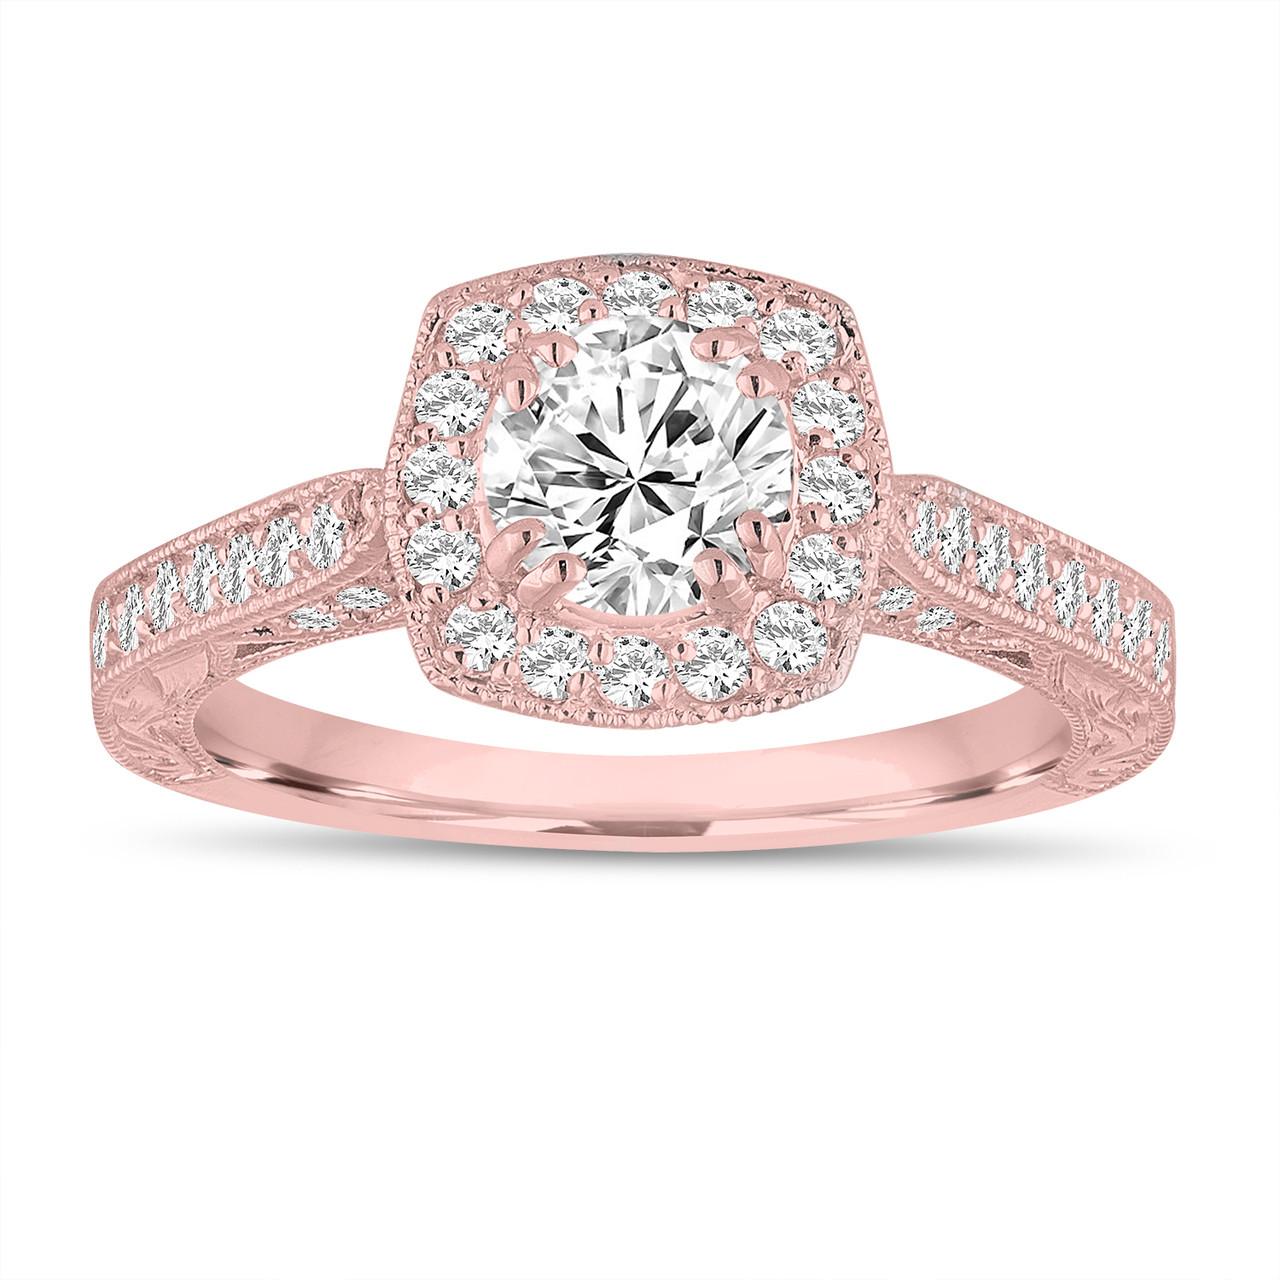 Engagement Rings Vintage Style: GIA Certified FSI1 Diamond Engagement Ring 1.15 Carat 14K